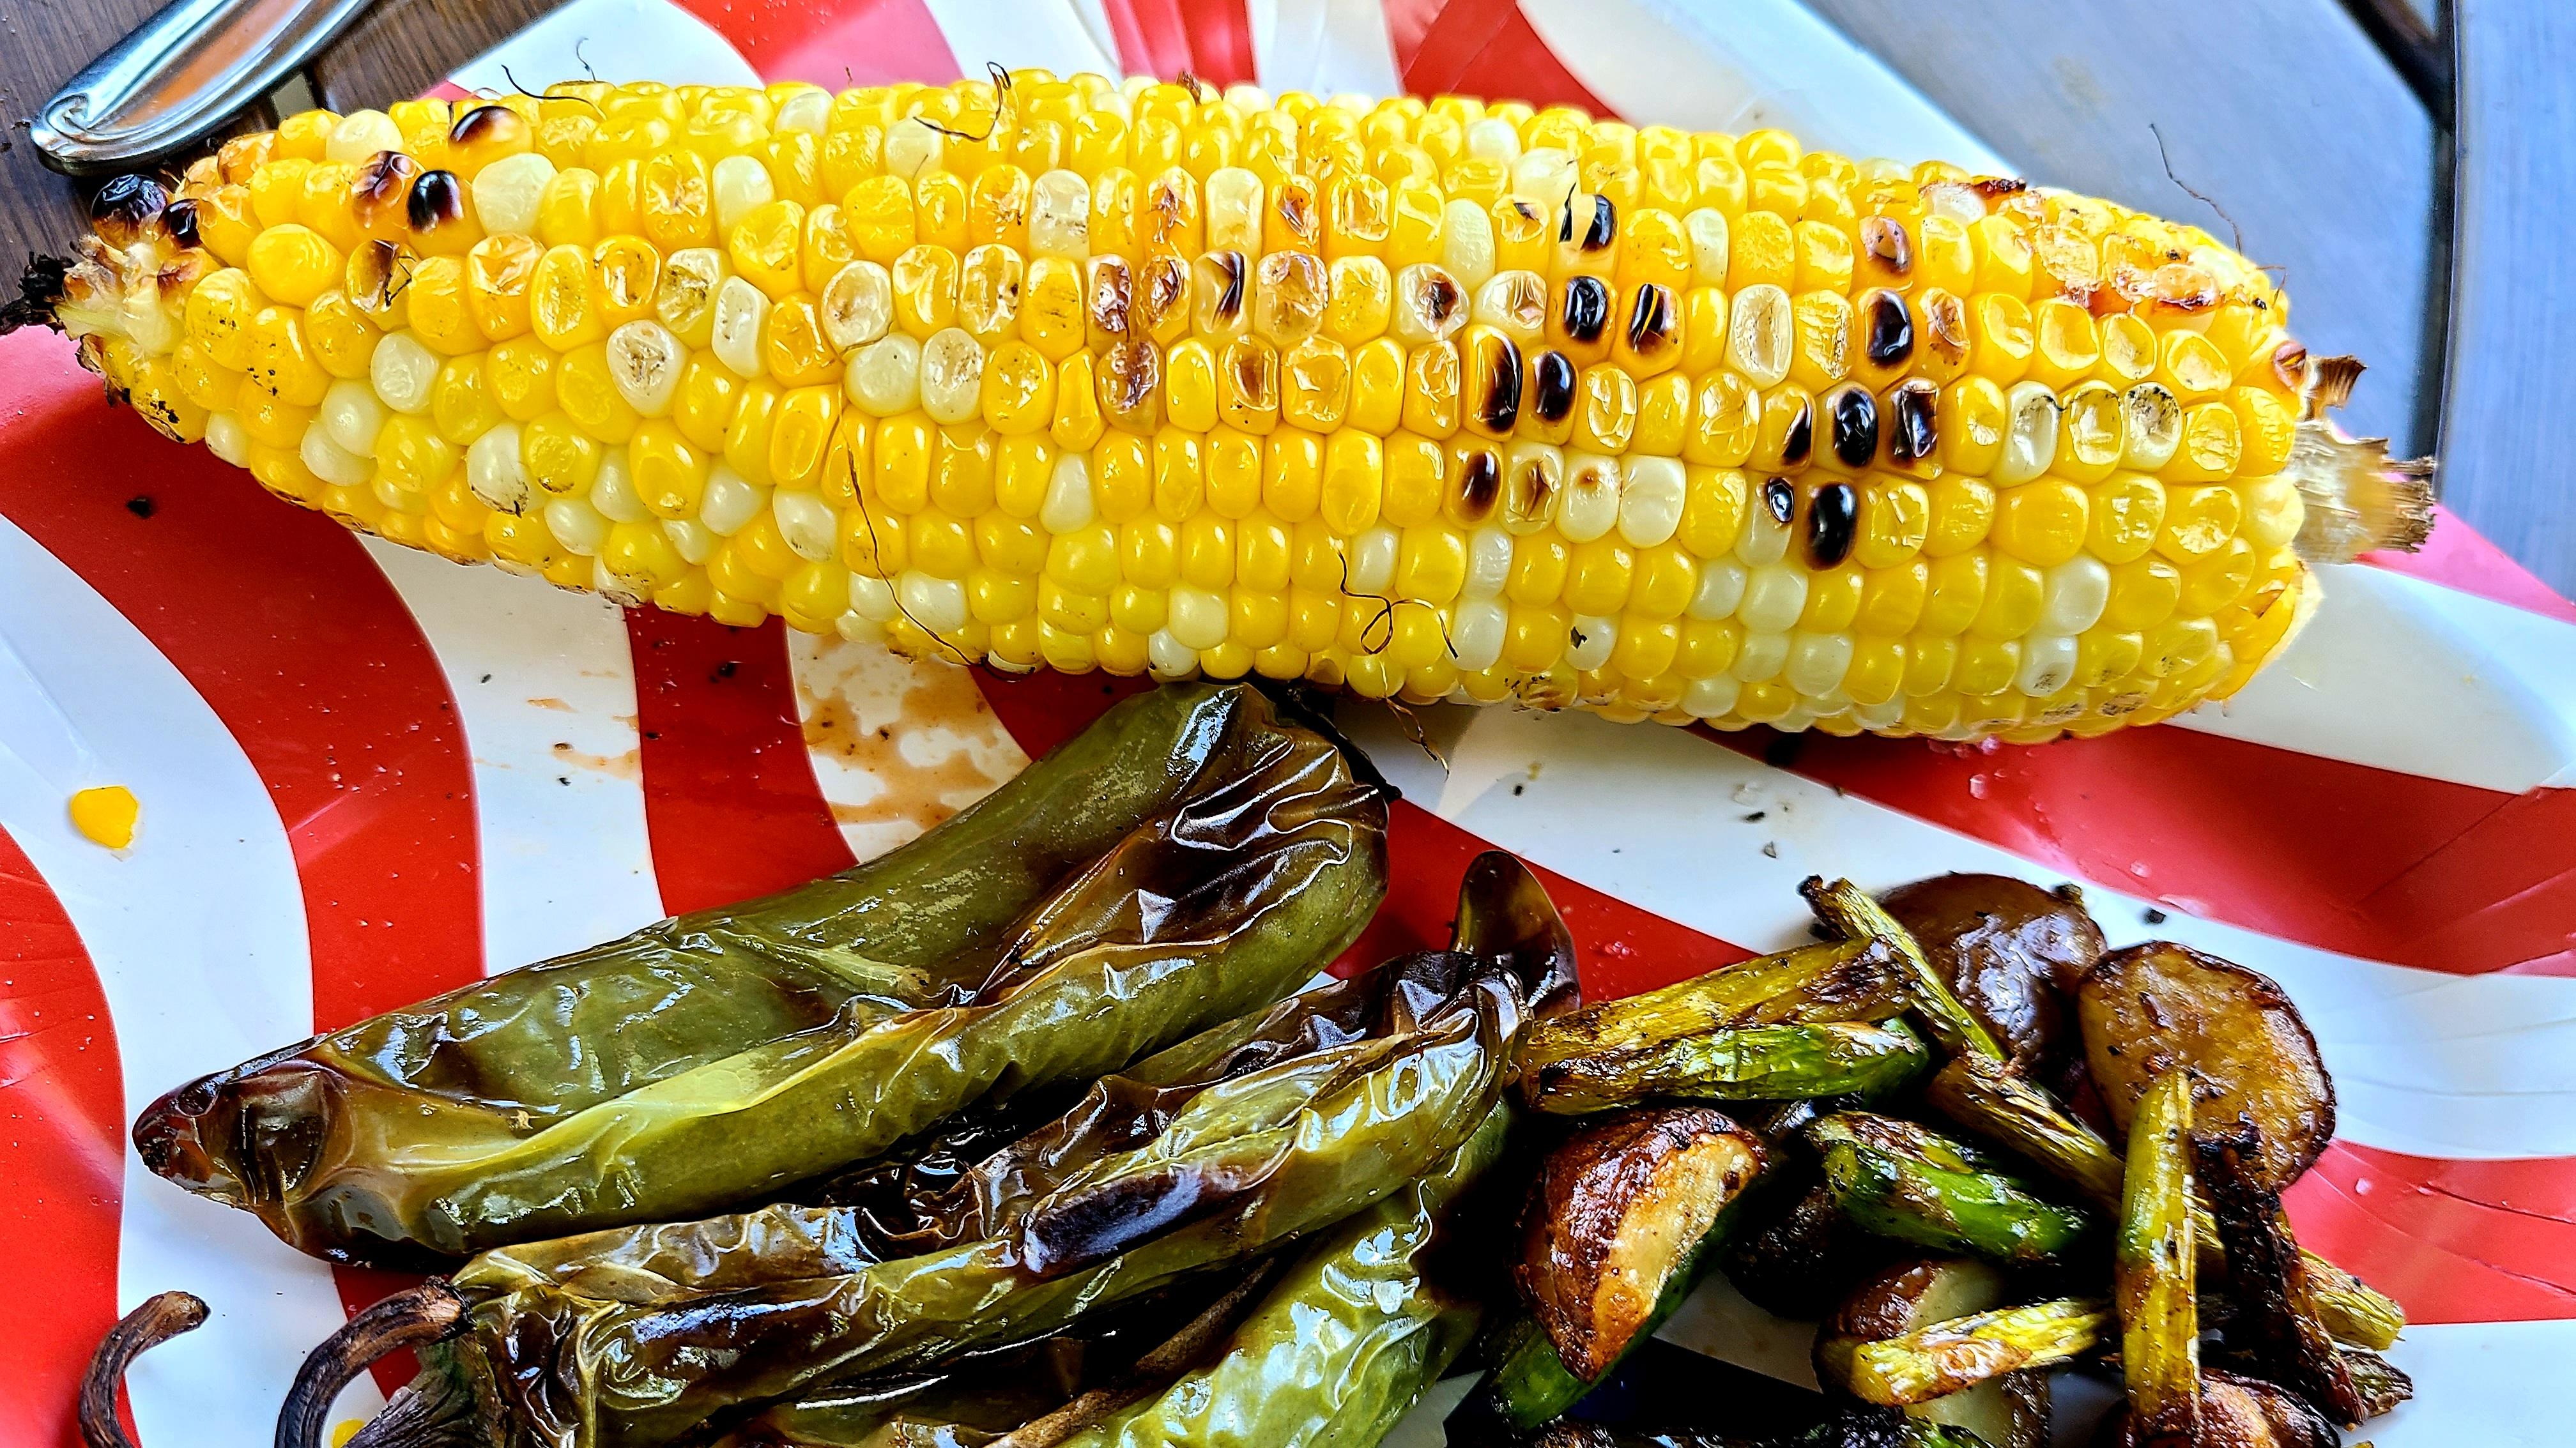 Parmesan Roasted Corn on the Cob_image